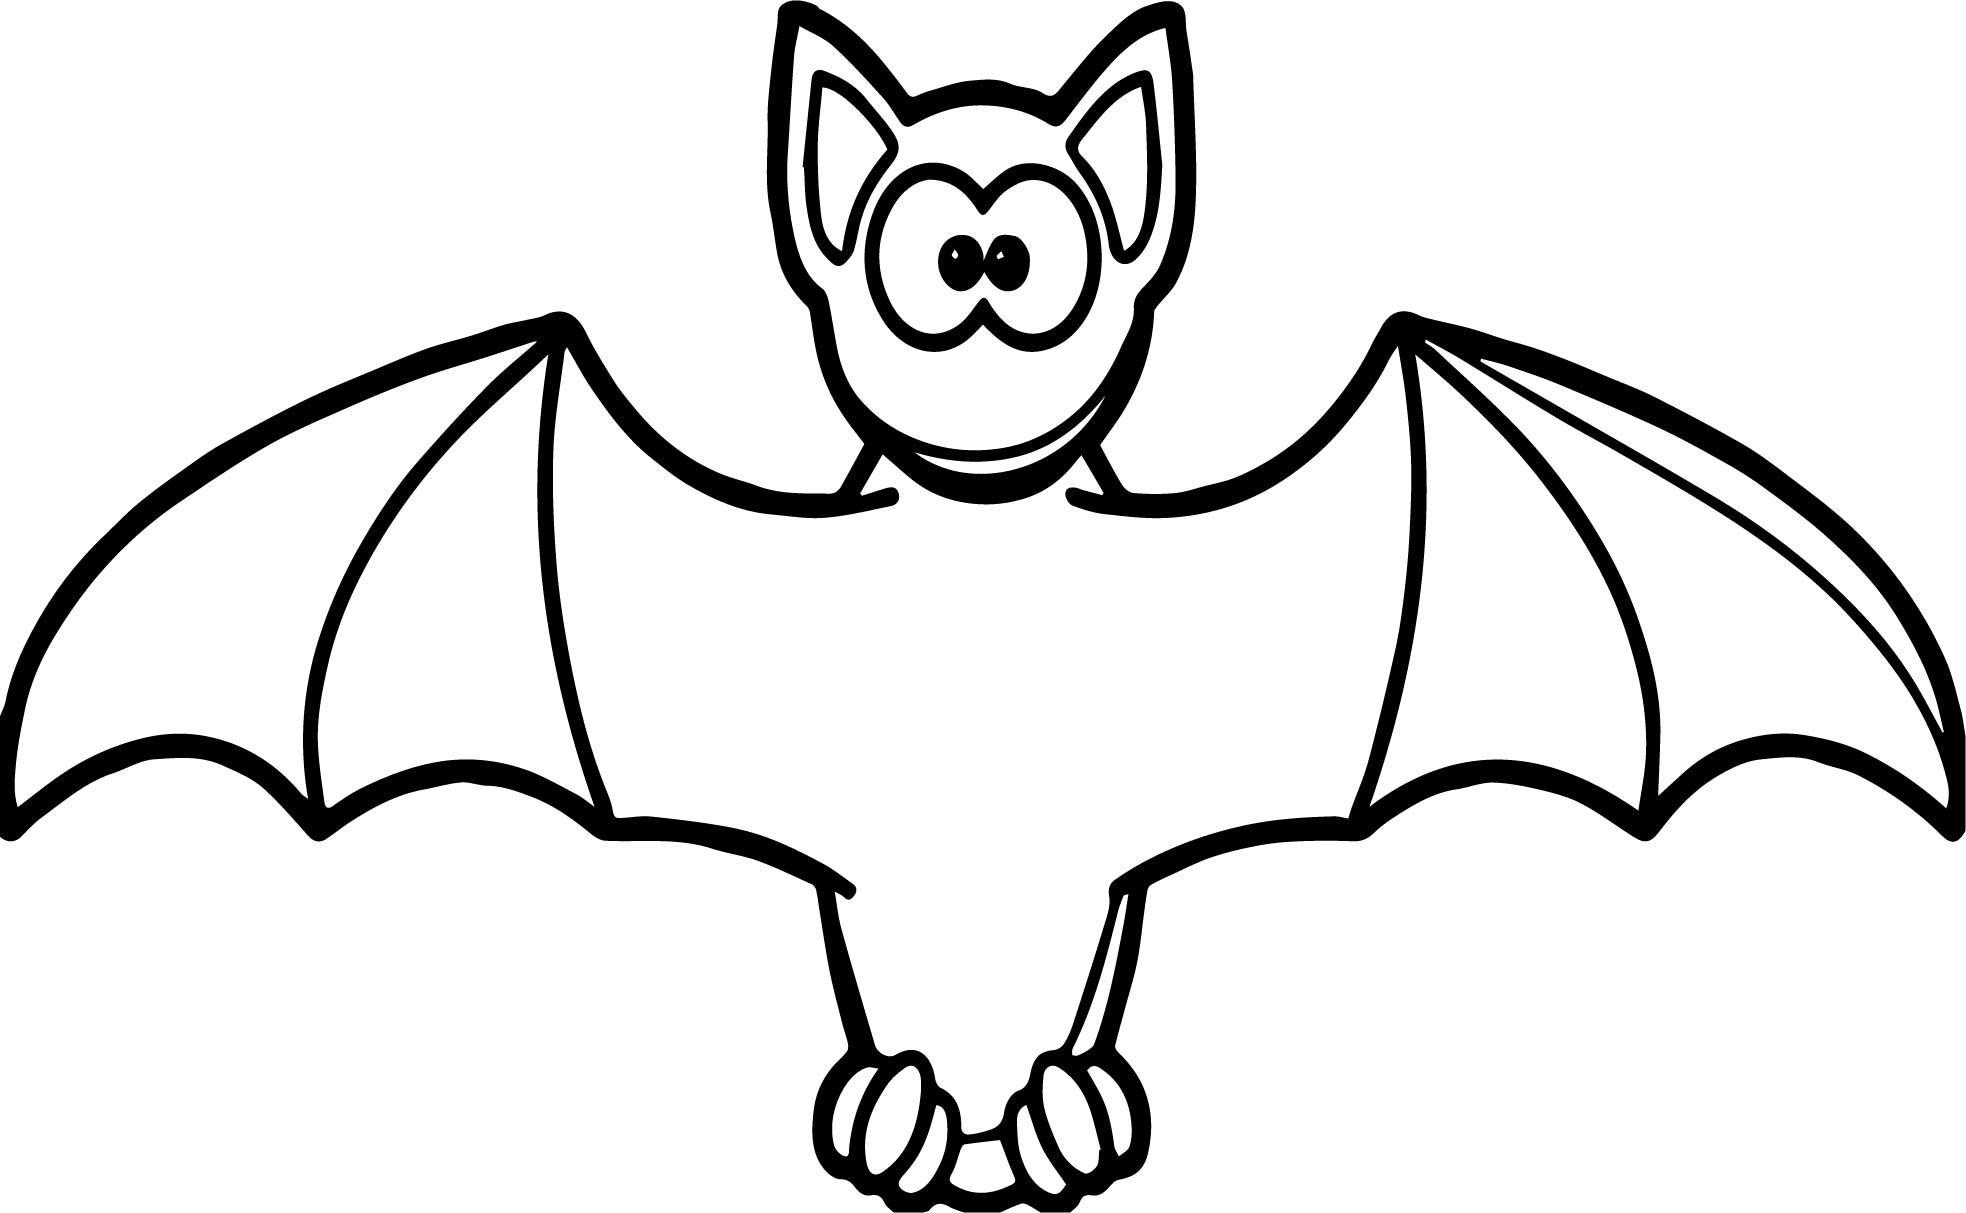 Cool cartooon vampire bat coloring page wecoloringpage pinterest